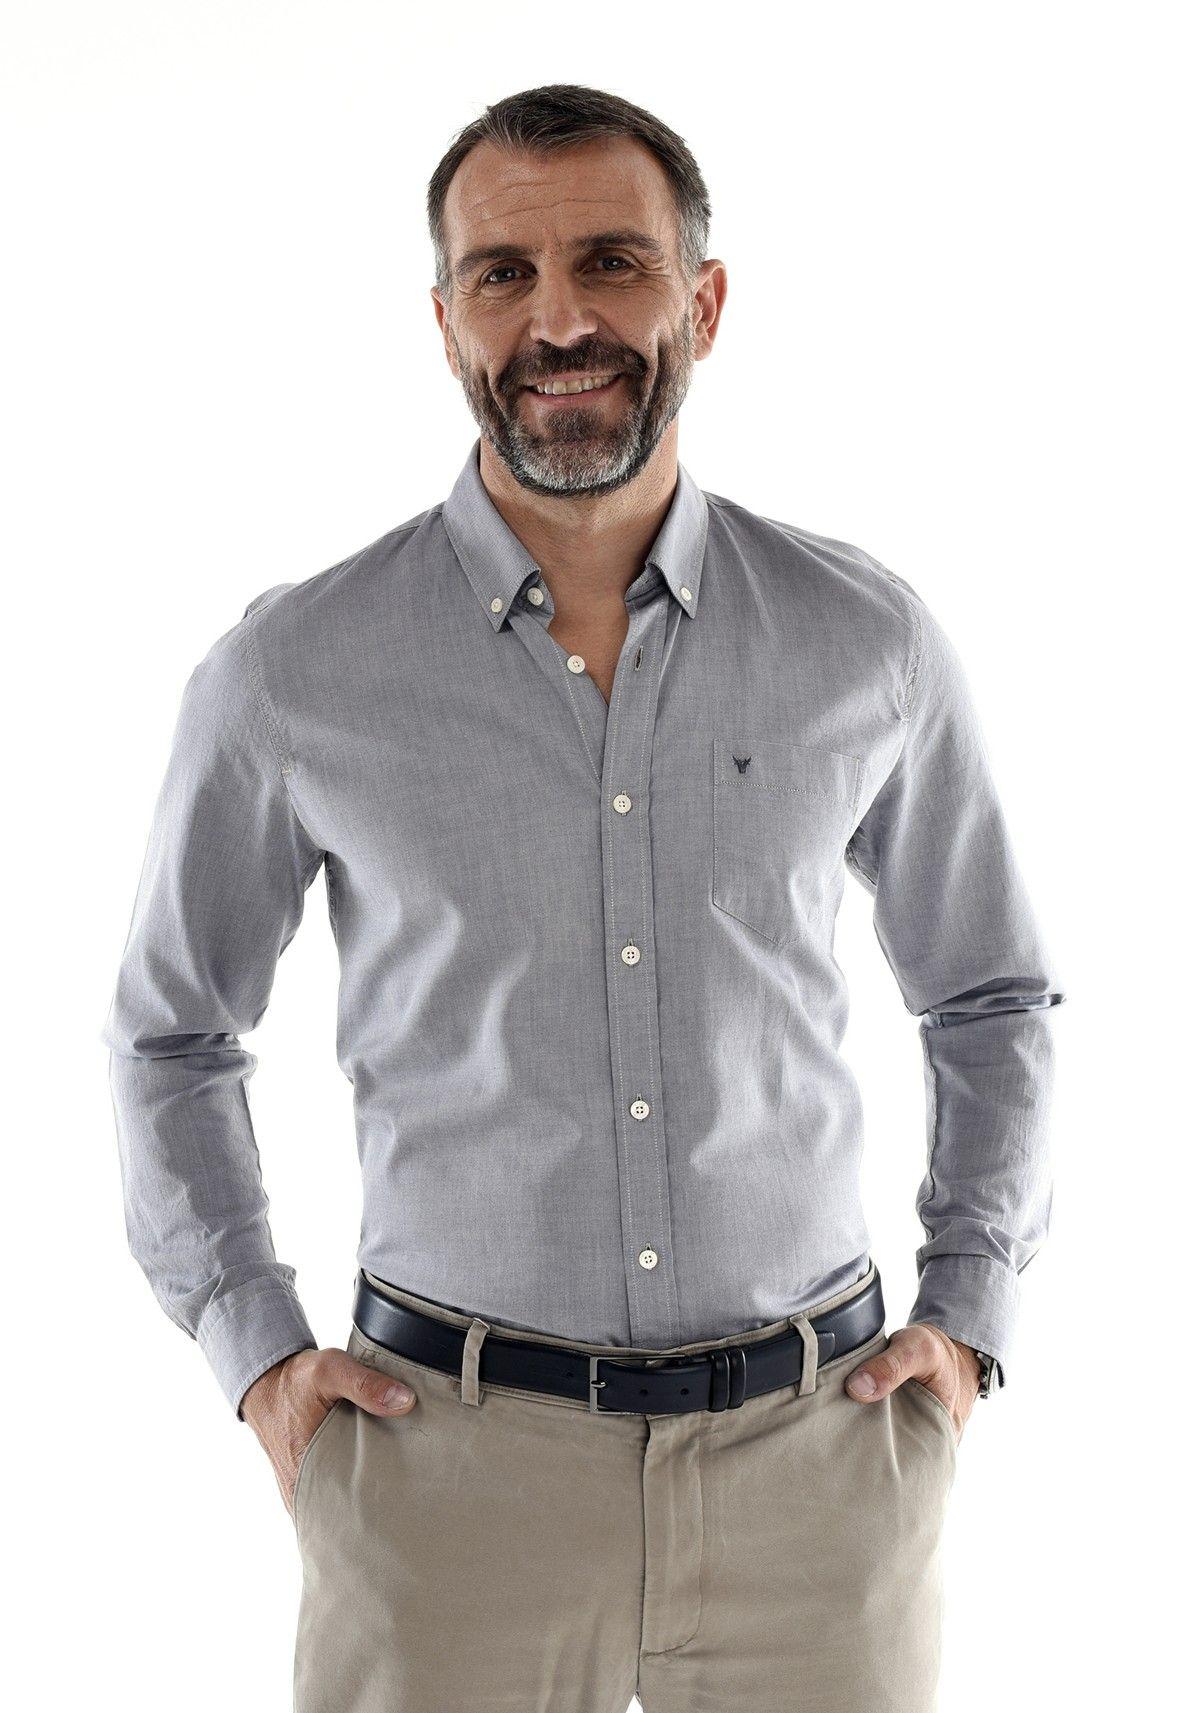 chemise mode homme classe grise oxford 100 coton style. Black Bedroom Furniture Sets. Home Design Ideas